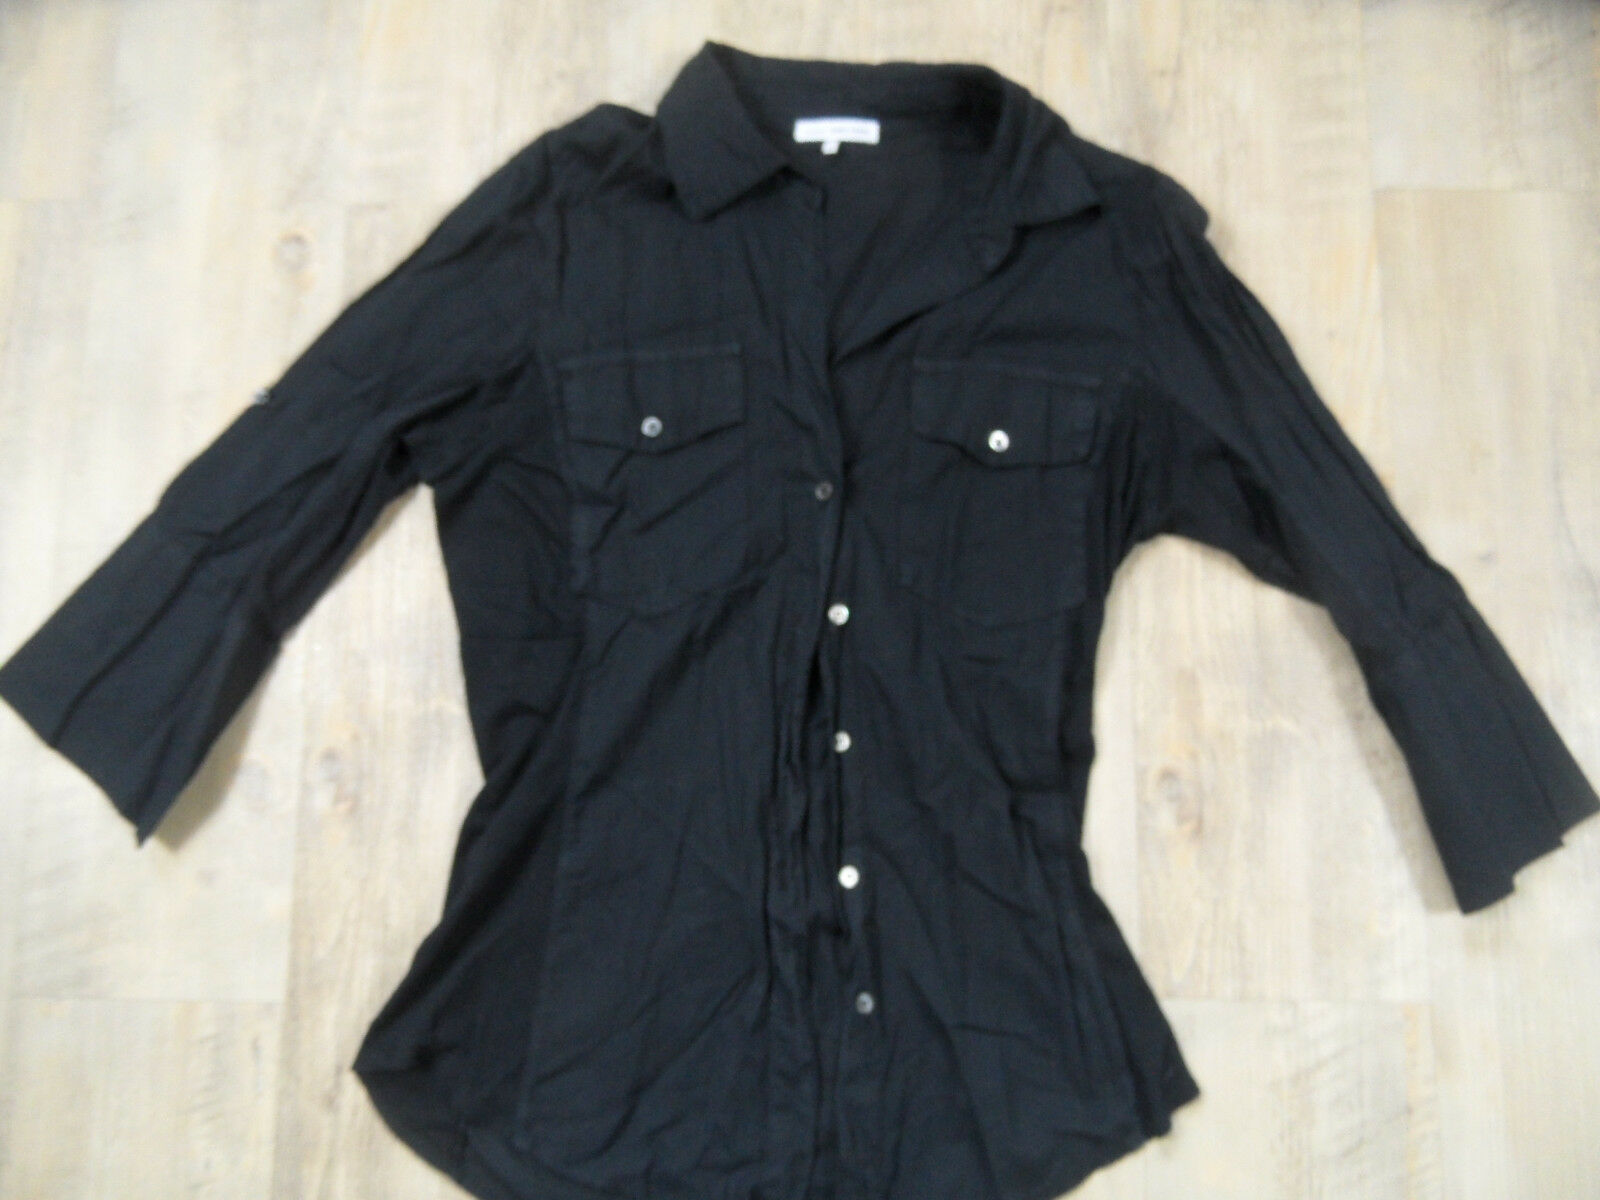 74f99dfc9dcb James Perse bella camicia 2 Top kos418 tg leggera nnomcc2352-T-shirt ...